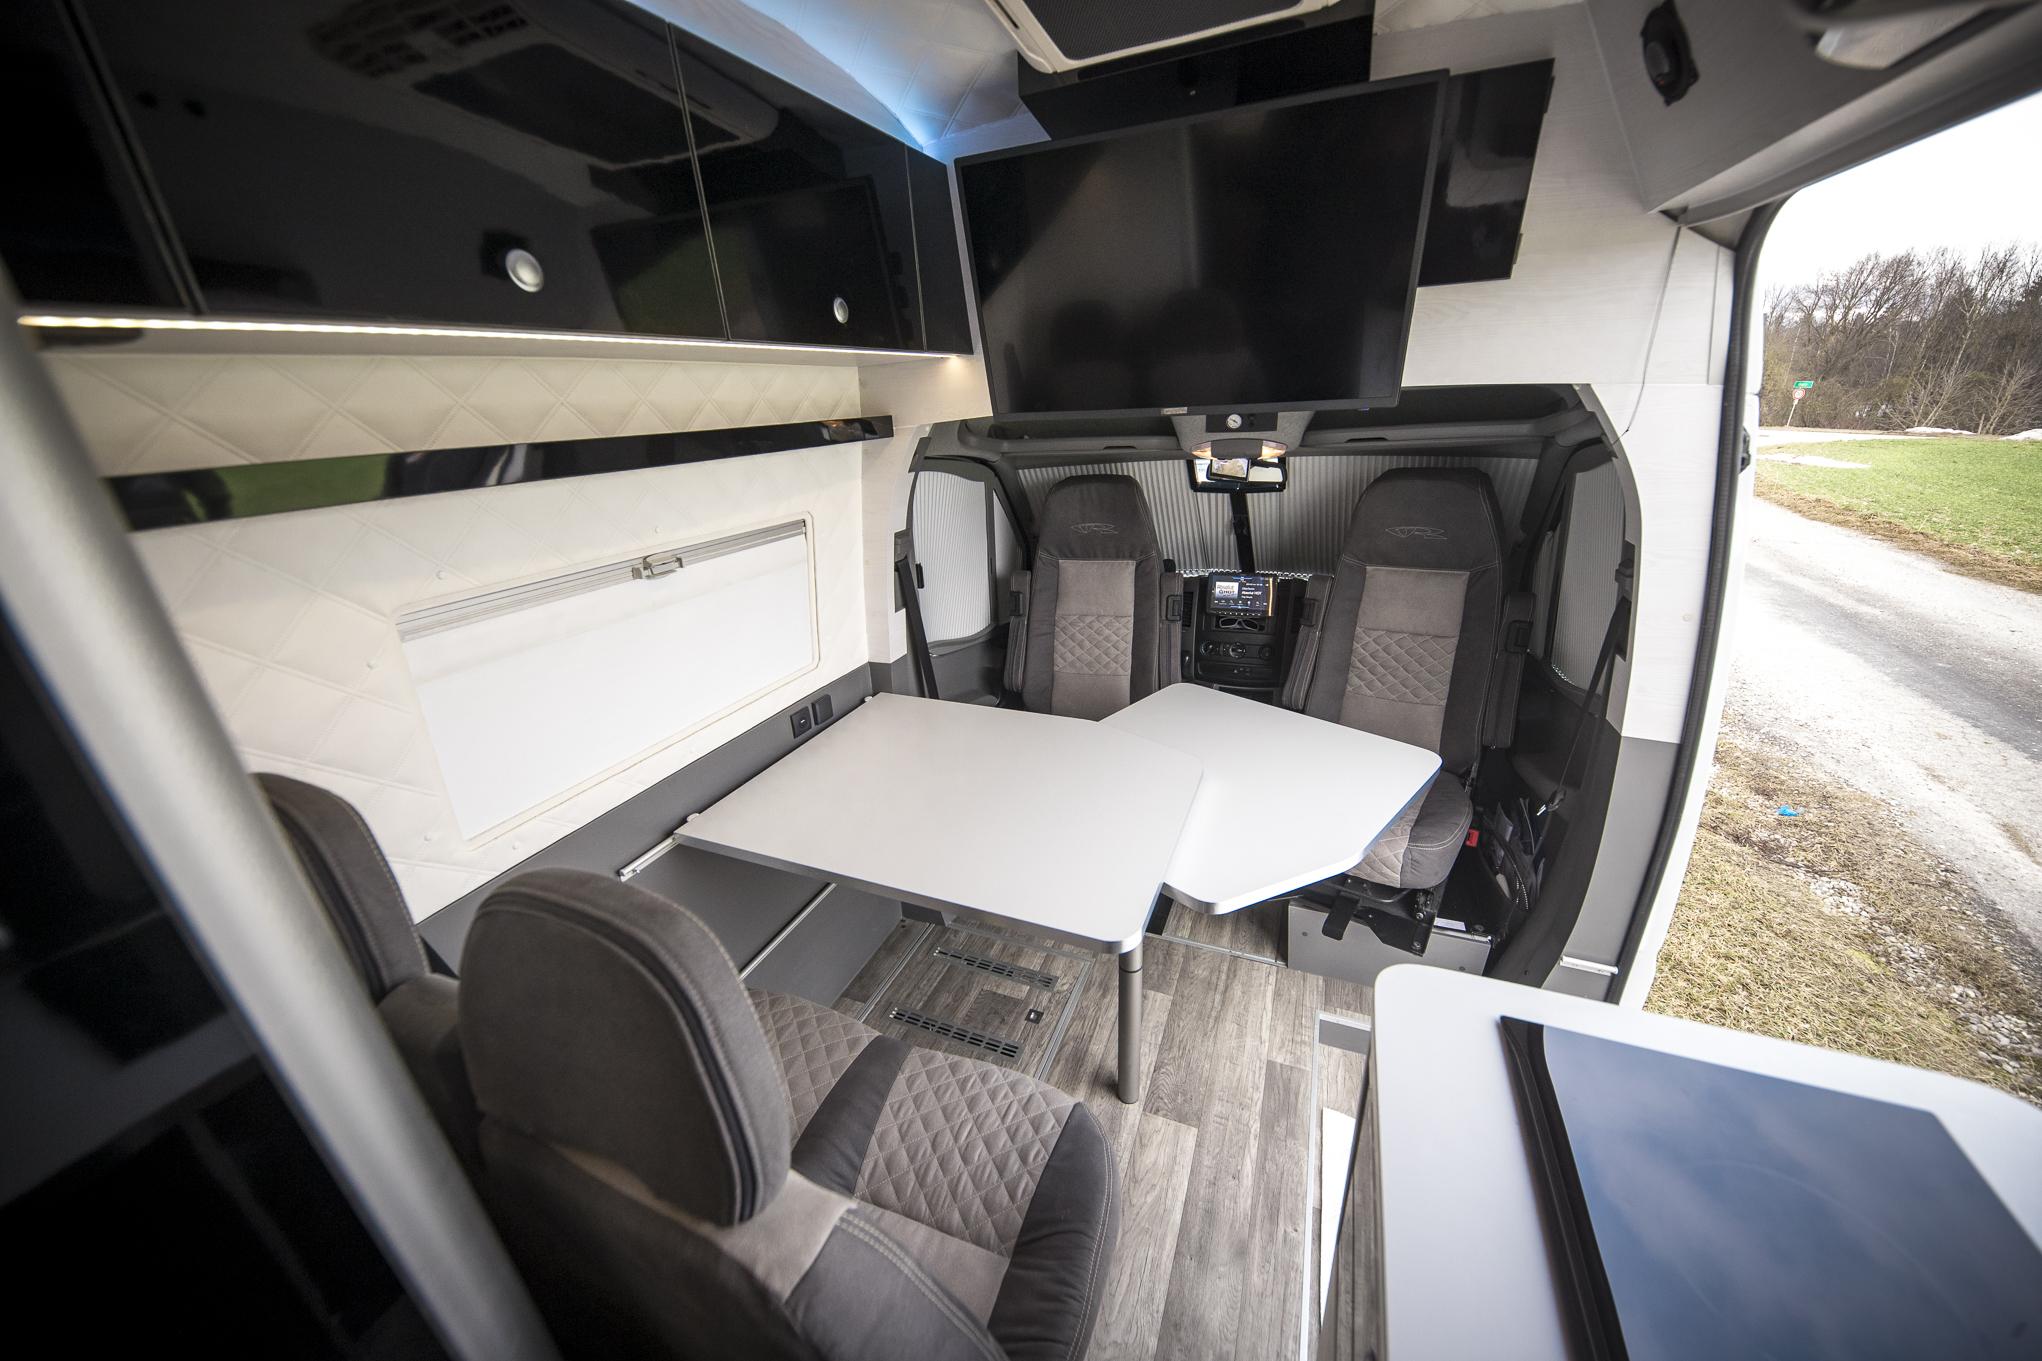 Mercedes Sprinter Motorhome